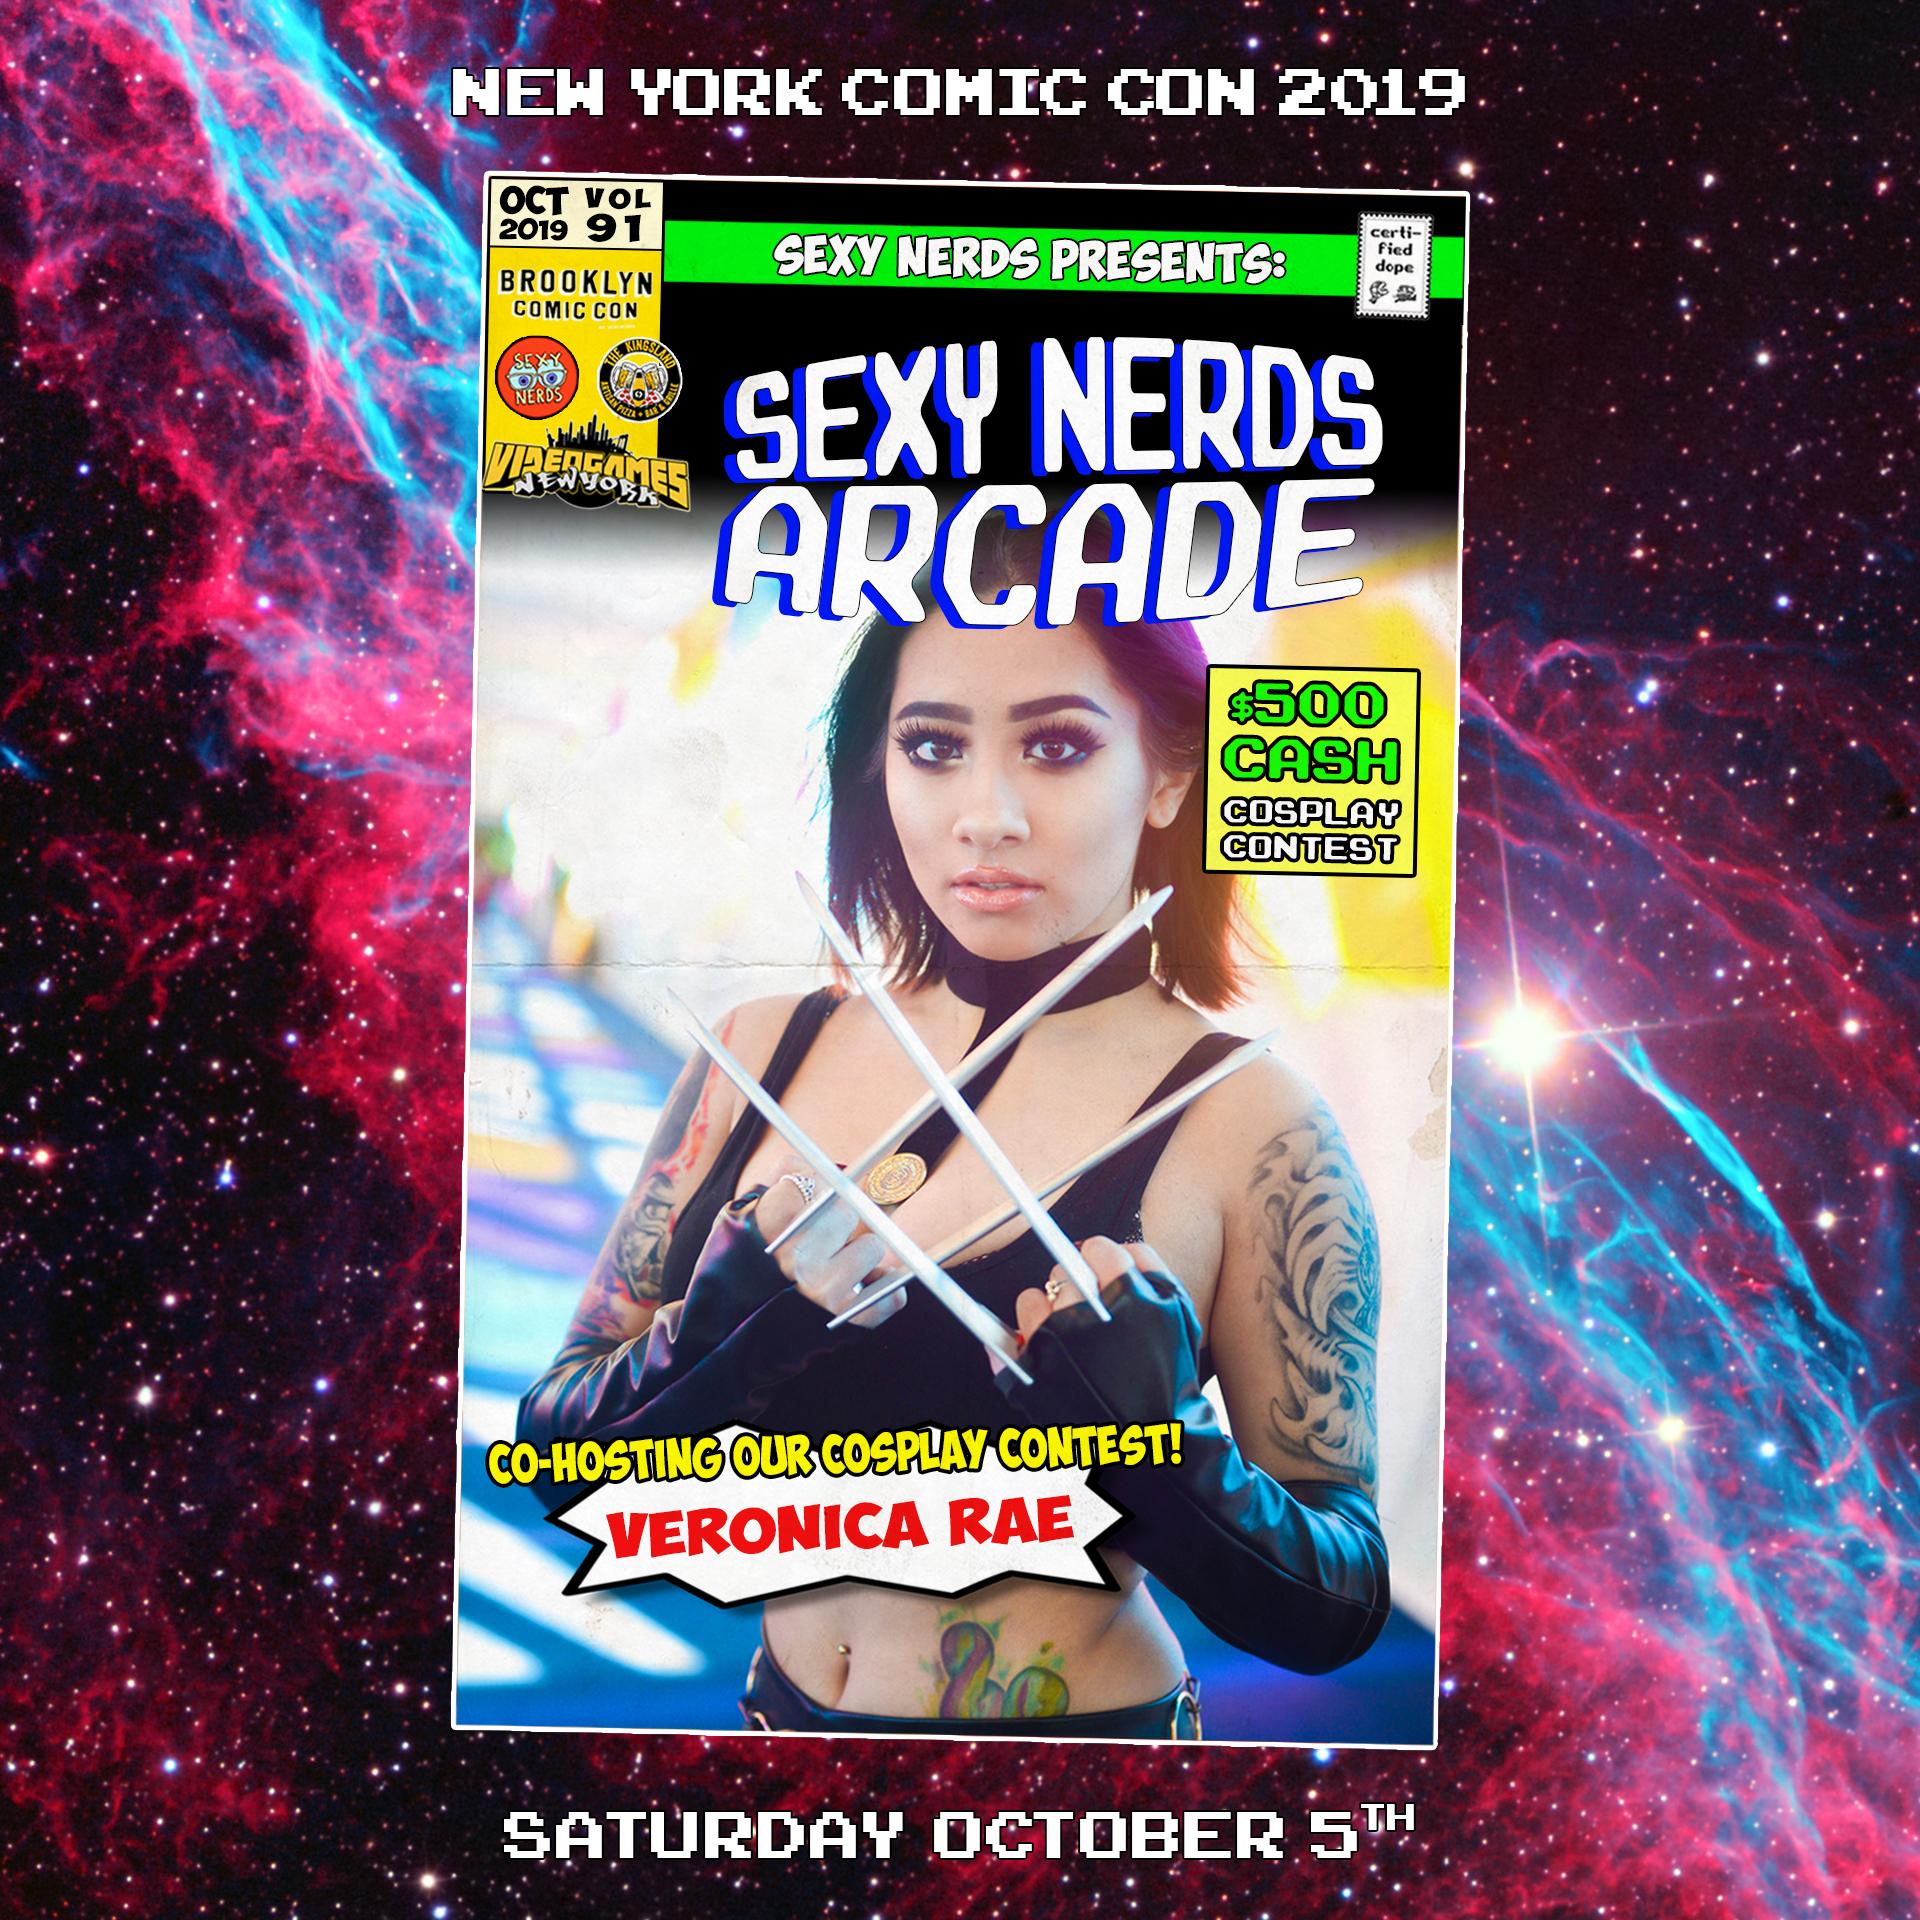 2019 NYCC Cosplay Comic Book veronica square.jpg